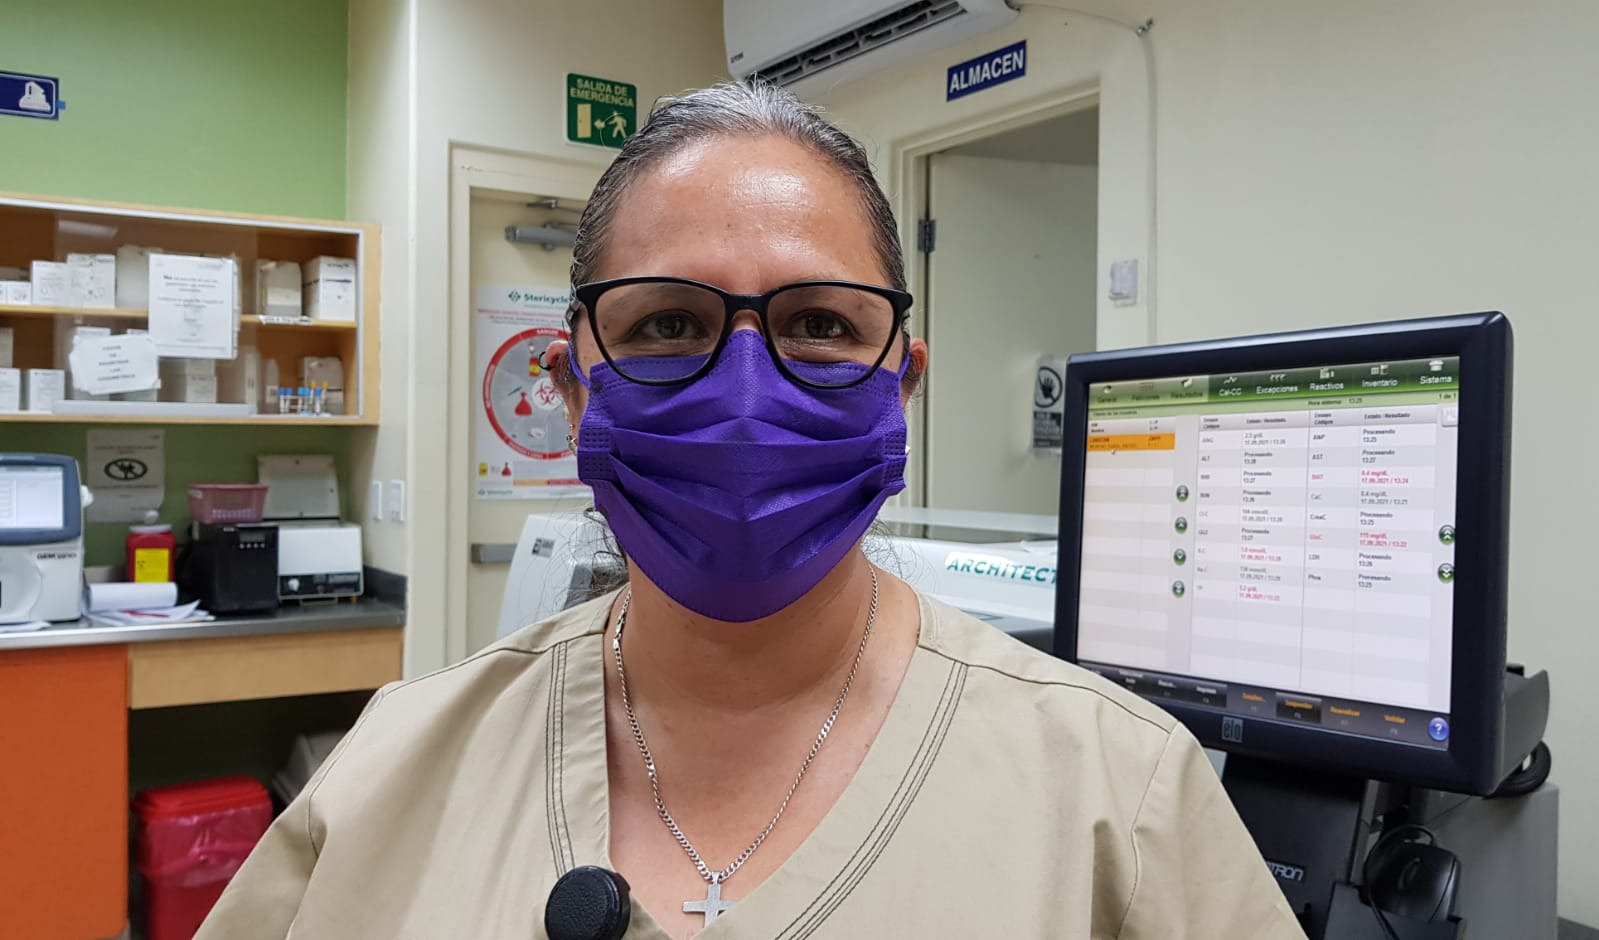 Química Farmacobióloga del Hospital General de Tijuana compartió su testimonio en la lucha contra el COVID-19